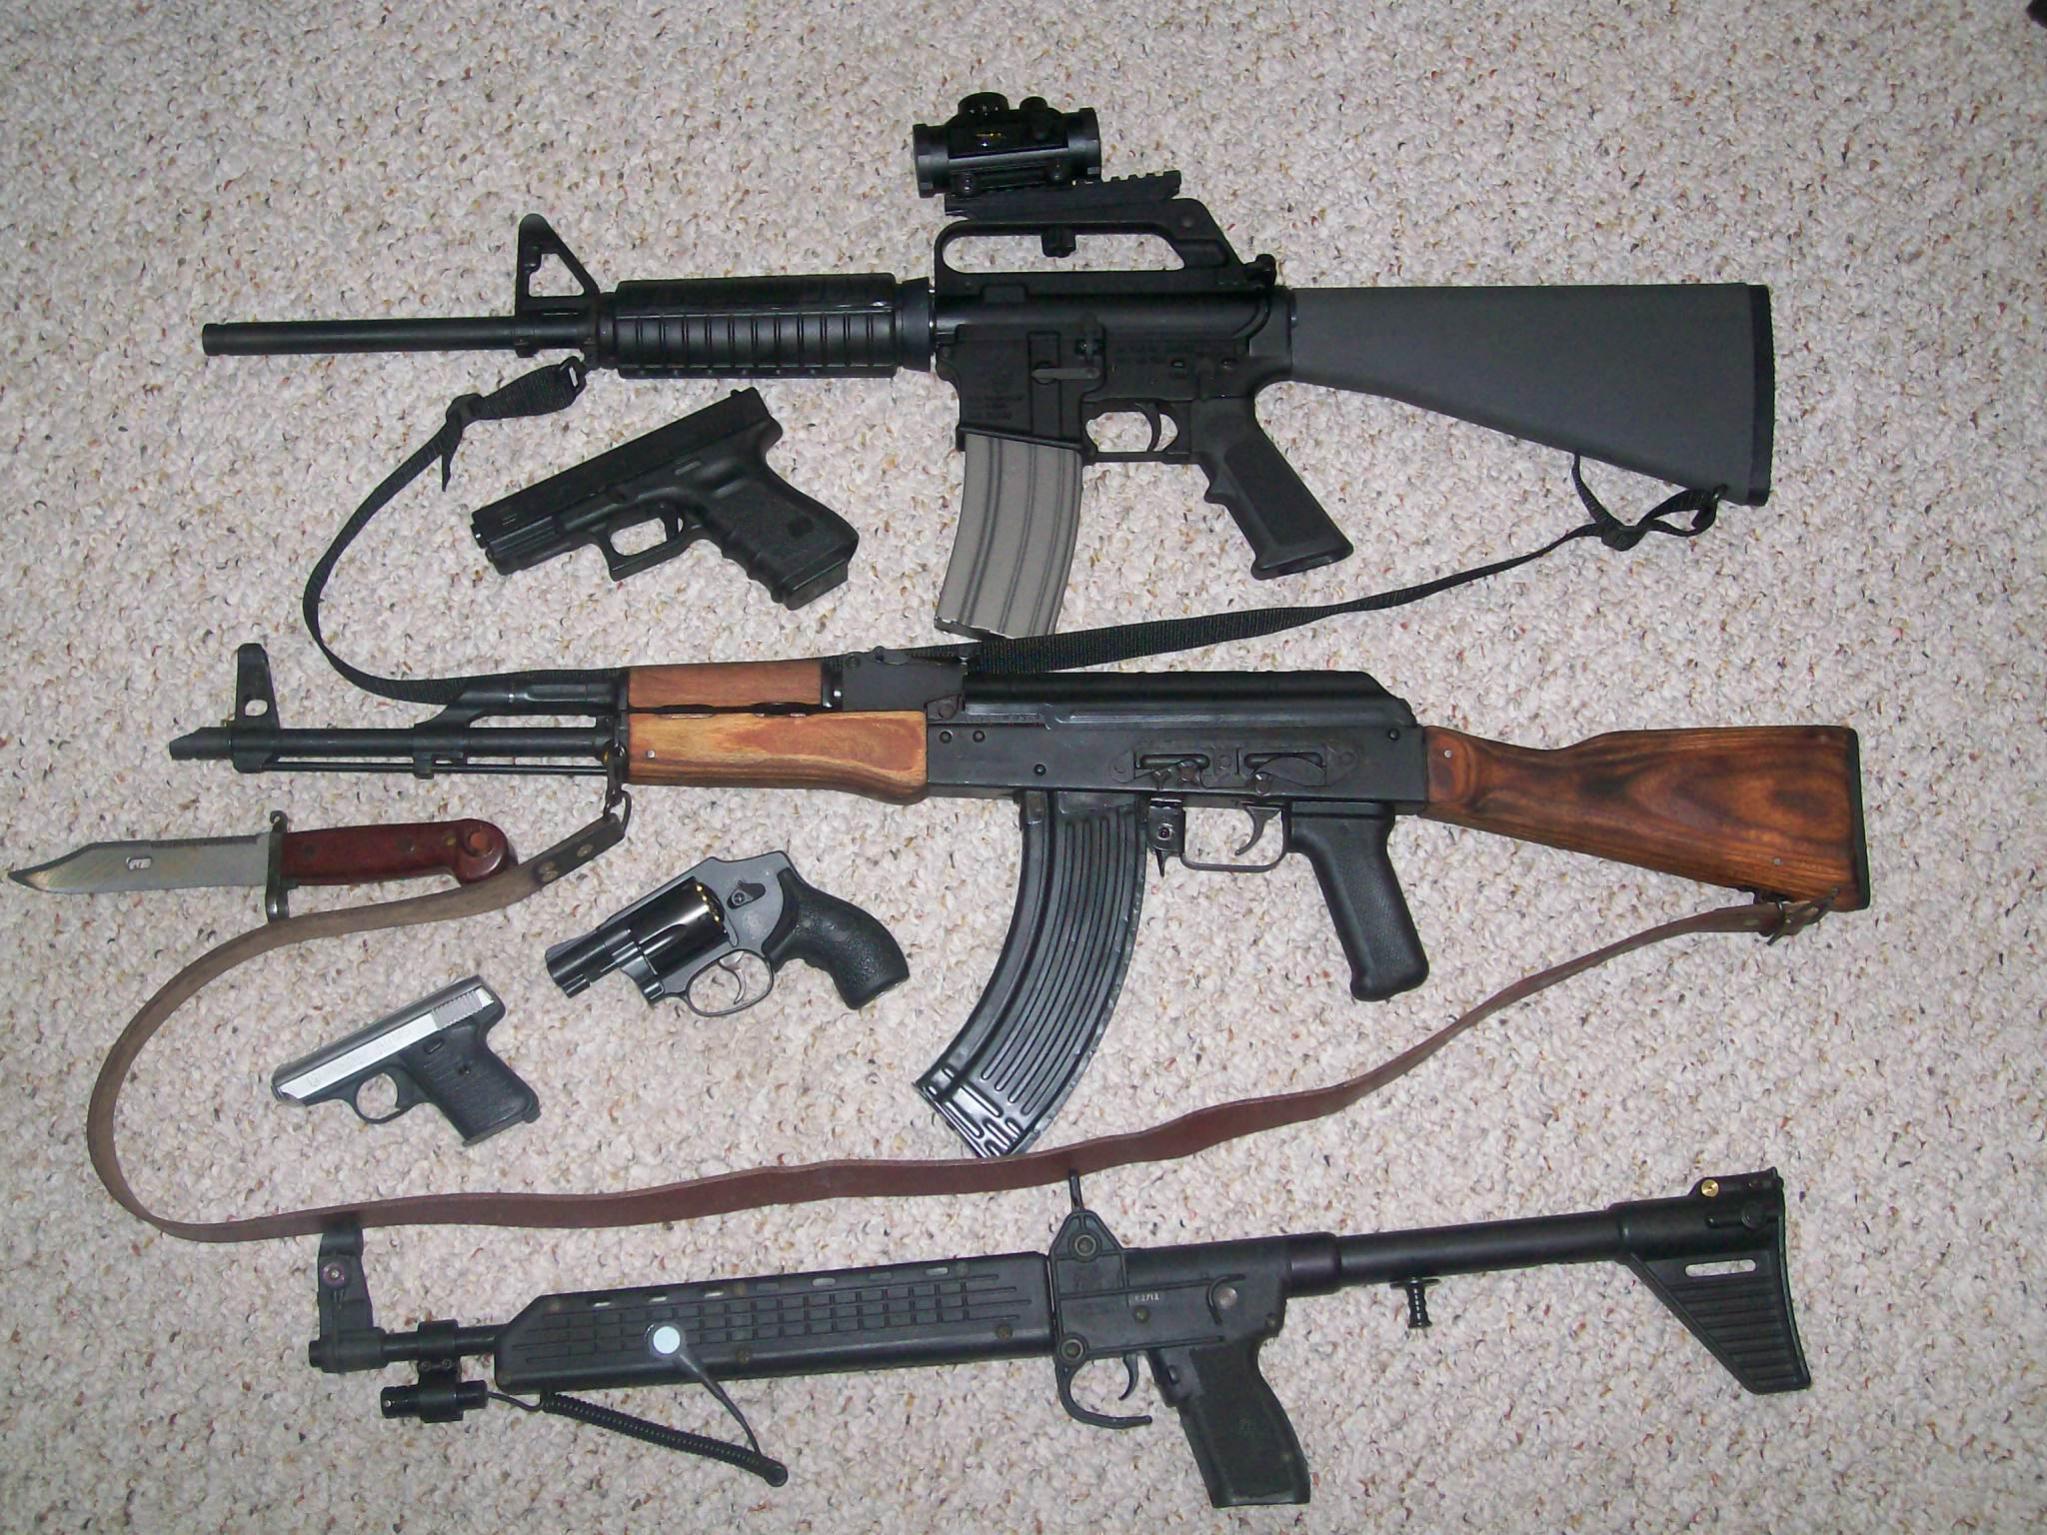 New Toy-guns-001.jpg